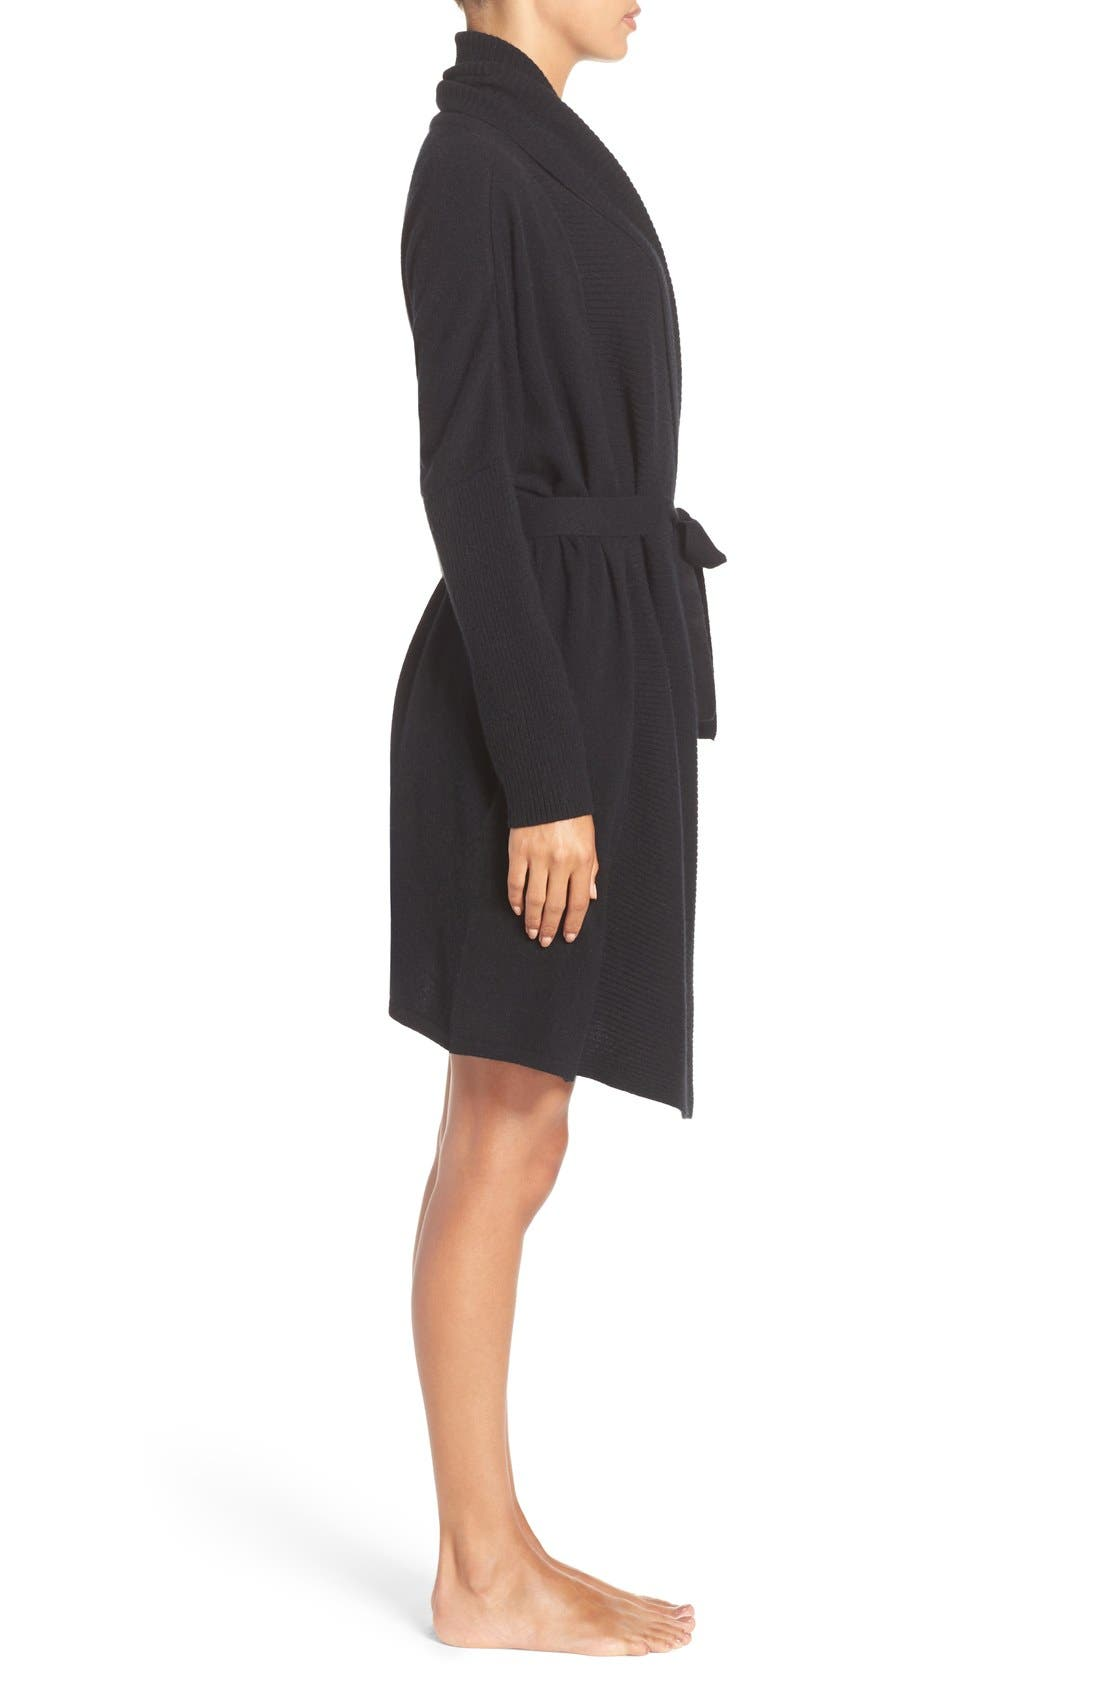 UGG 'Cheyenne' Cashmere Robe,                             Alternate thumbnail 3, color,                             Black